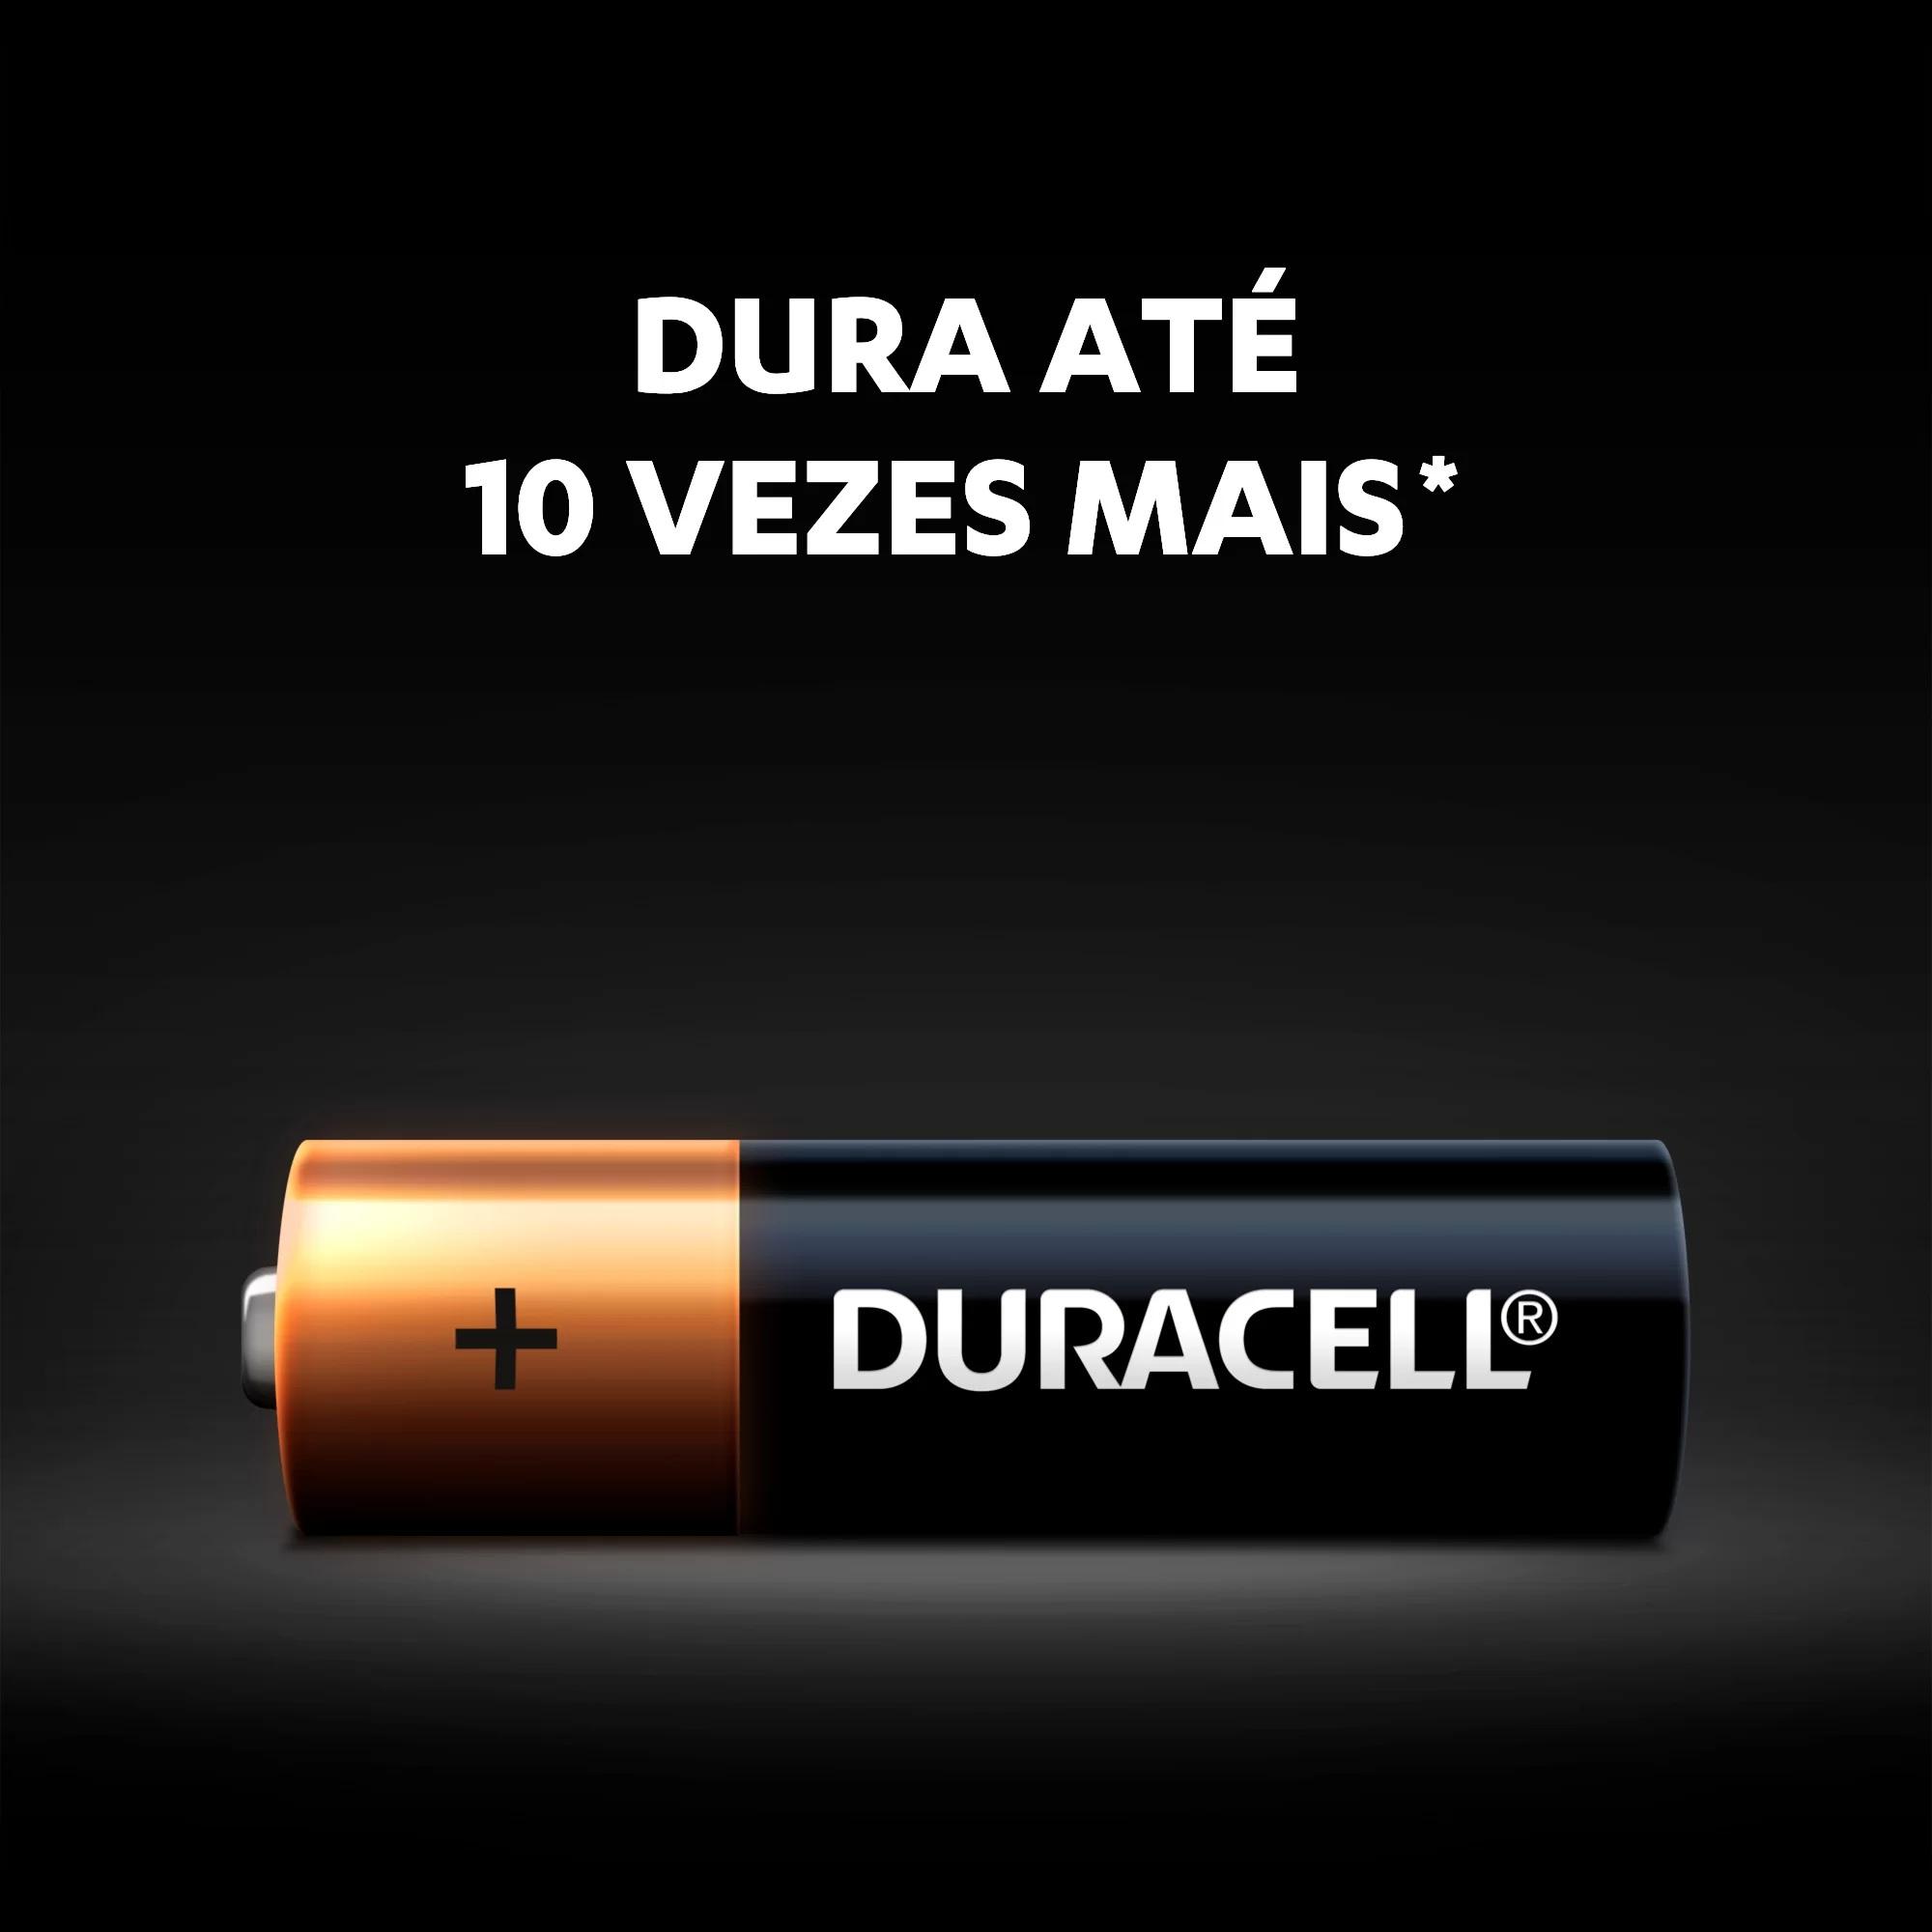 Kit 80 Pilha AA Alcalina Duracell 5 Cartelas C/16 Unidades Revenda Atacado Original